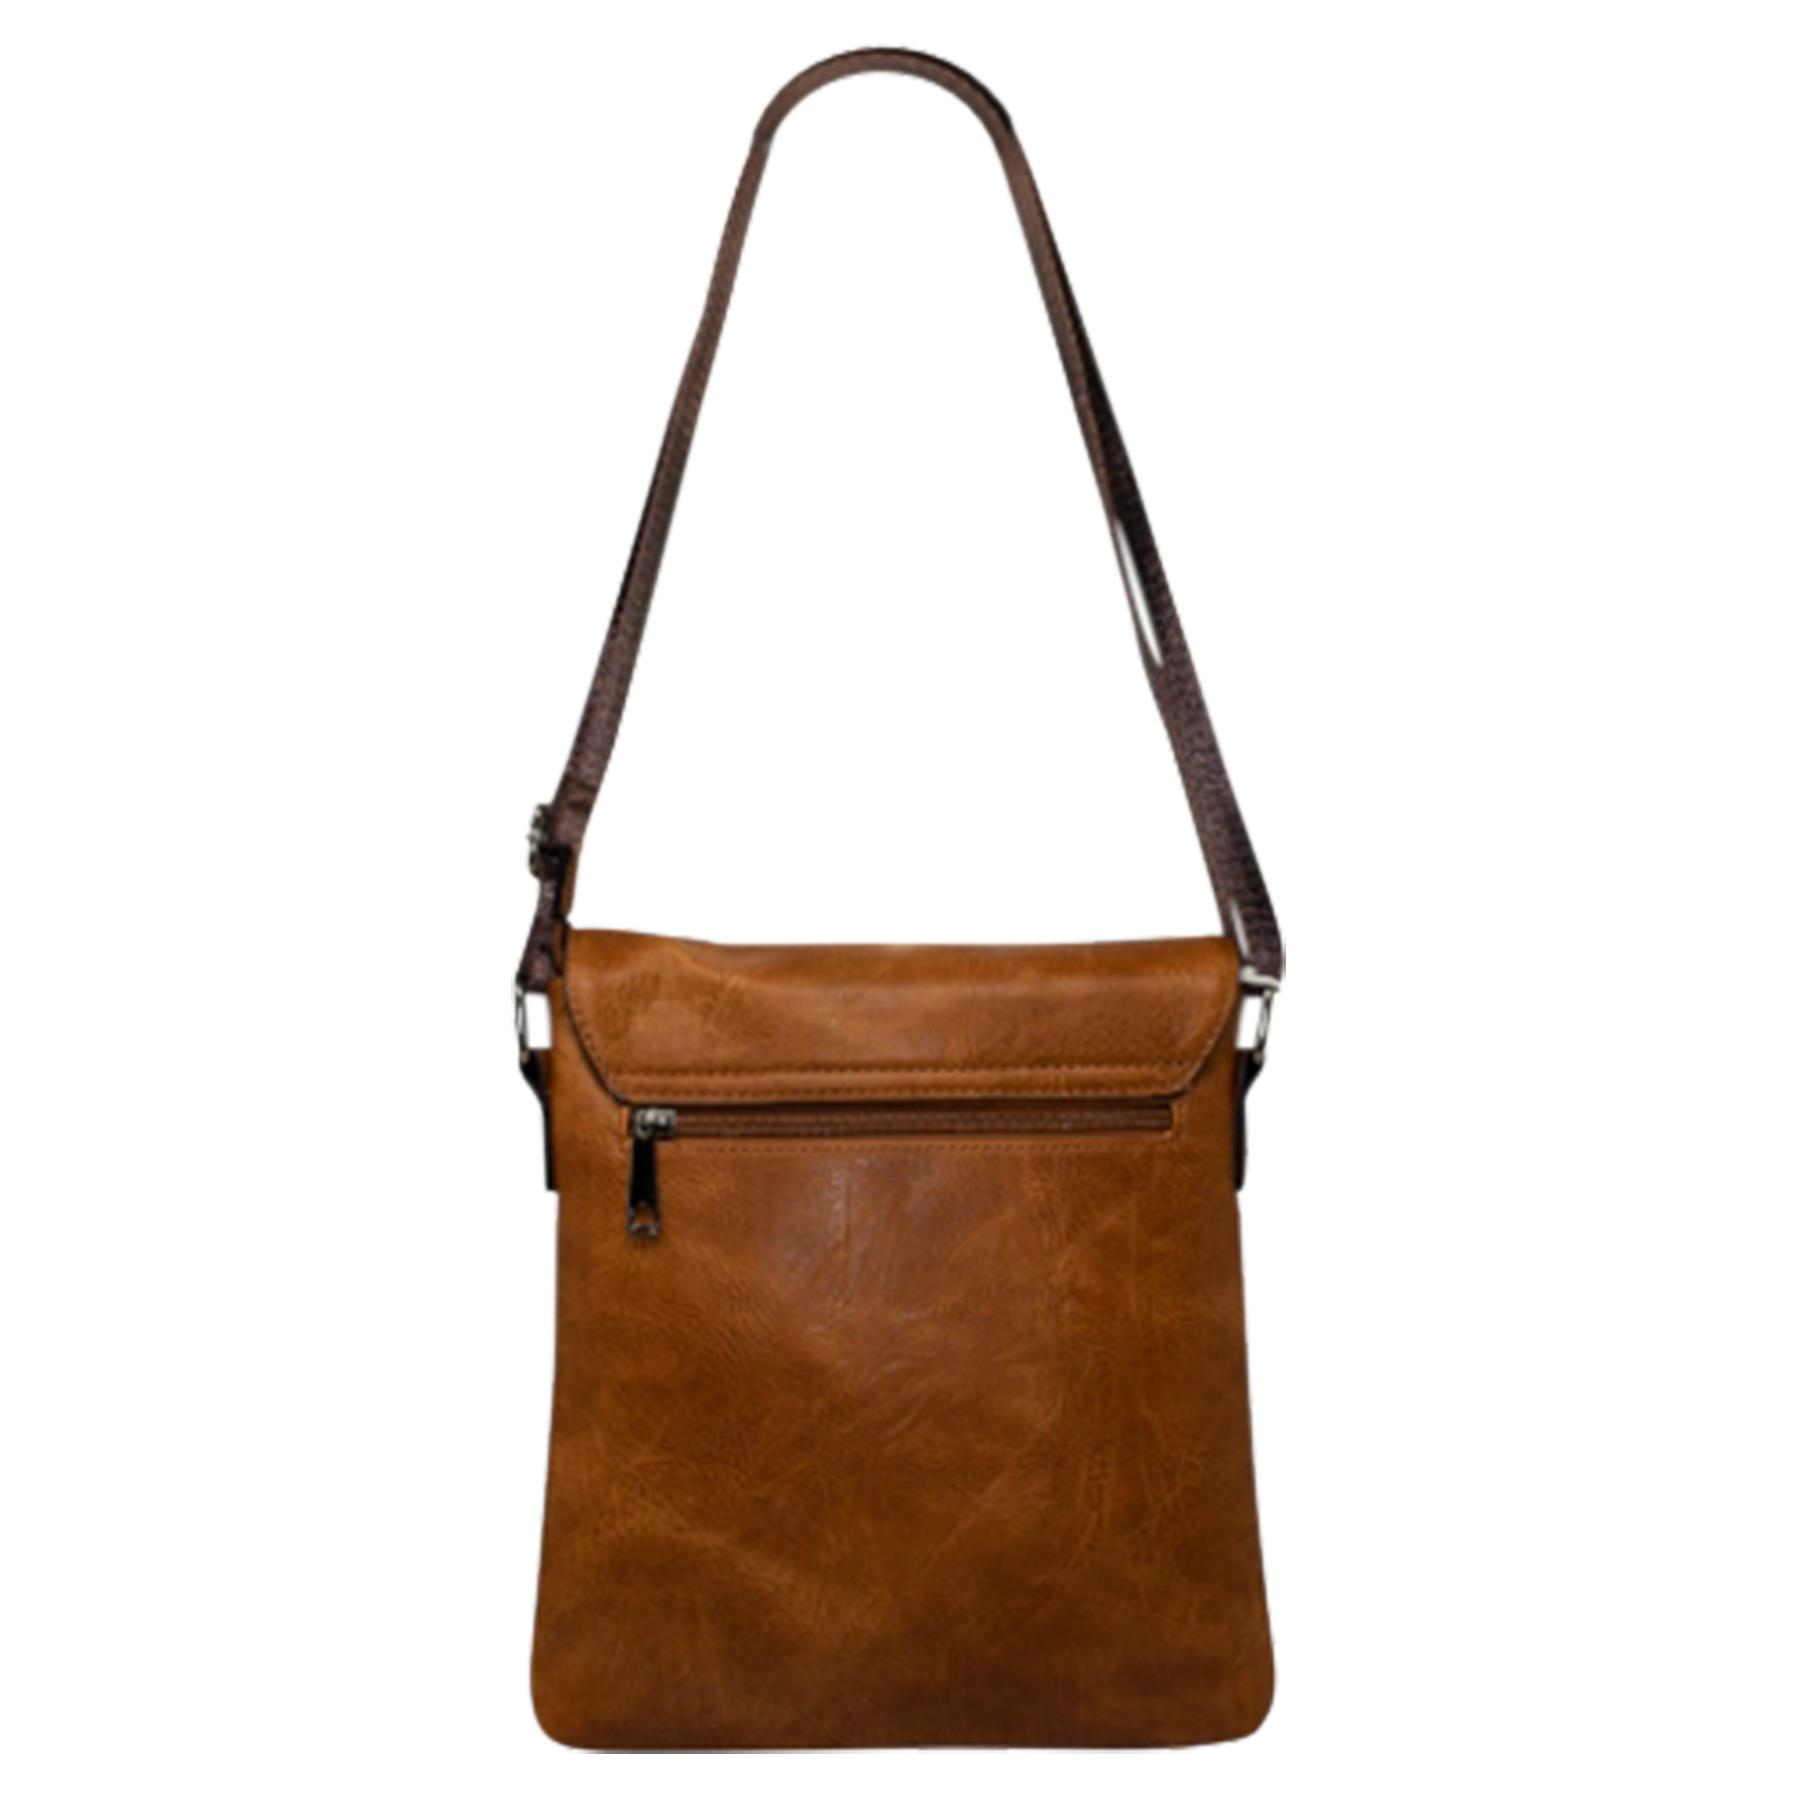 New-Plain-Faux-Leather-Men-s-Travel-Casual-Flap-Over-Messenger-Bag thumbnail 8